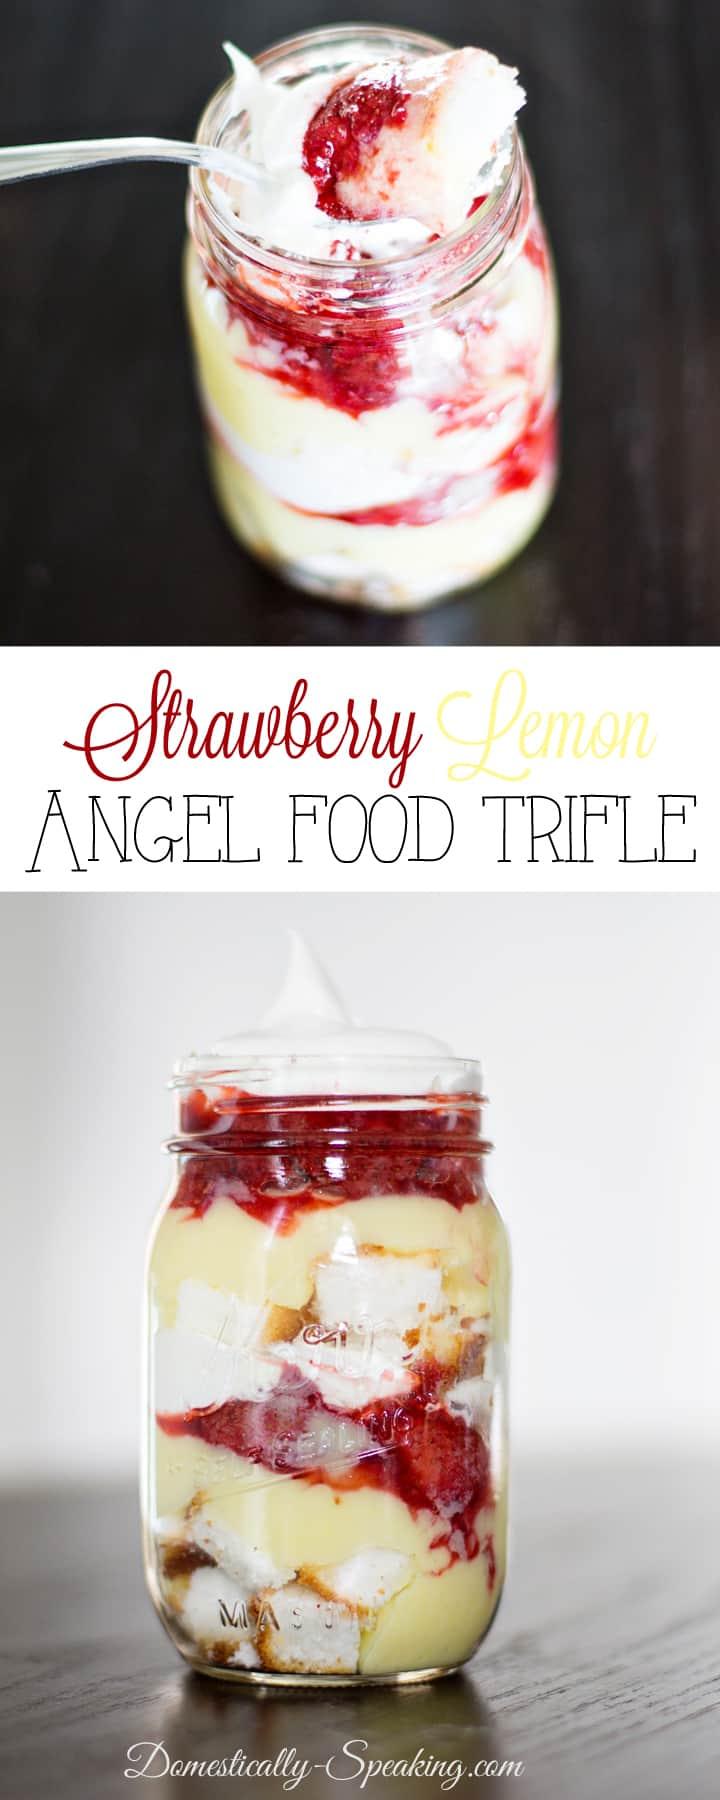 Mason Jar Strawberry Lemon Angel Food Trifle